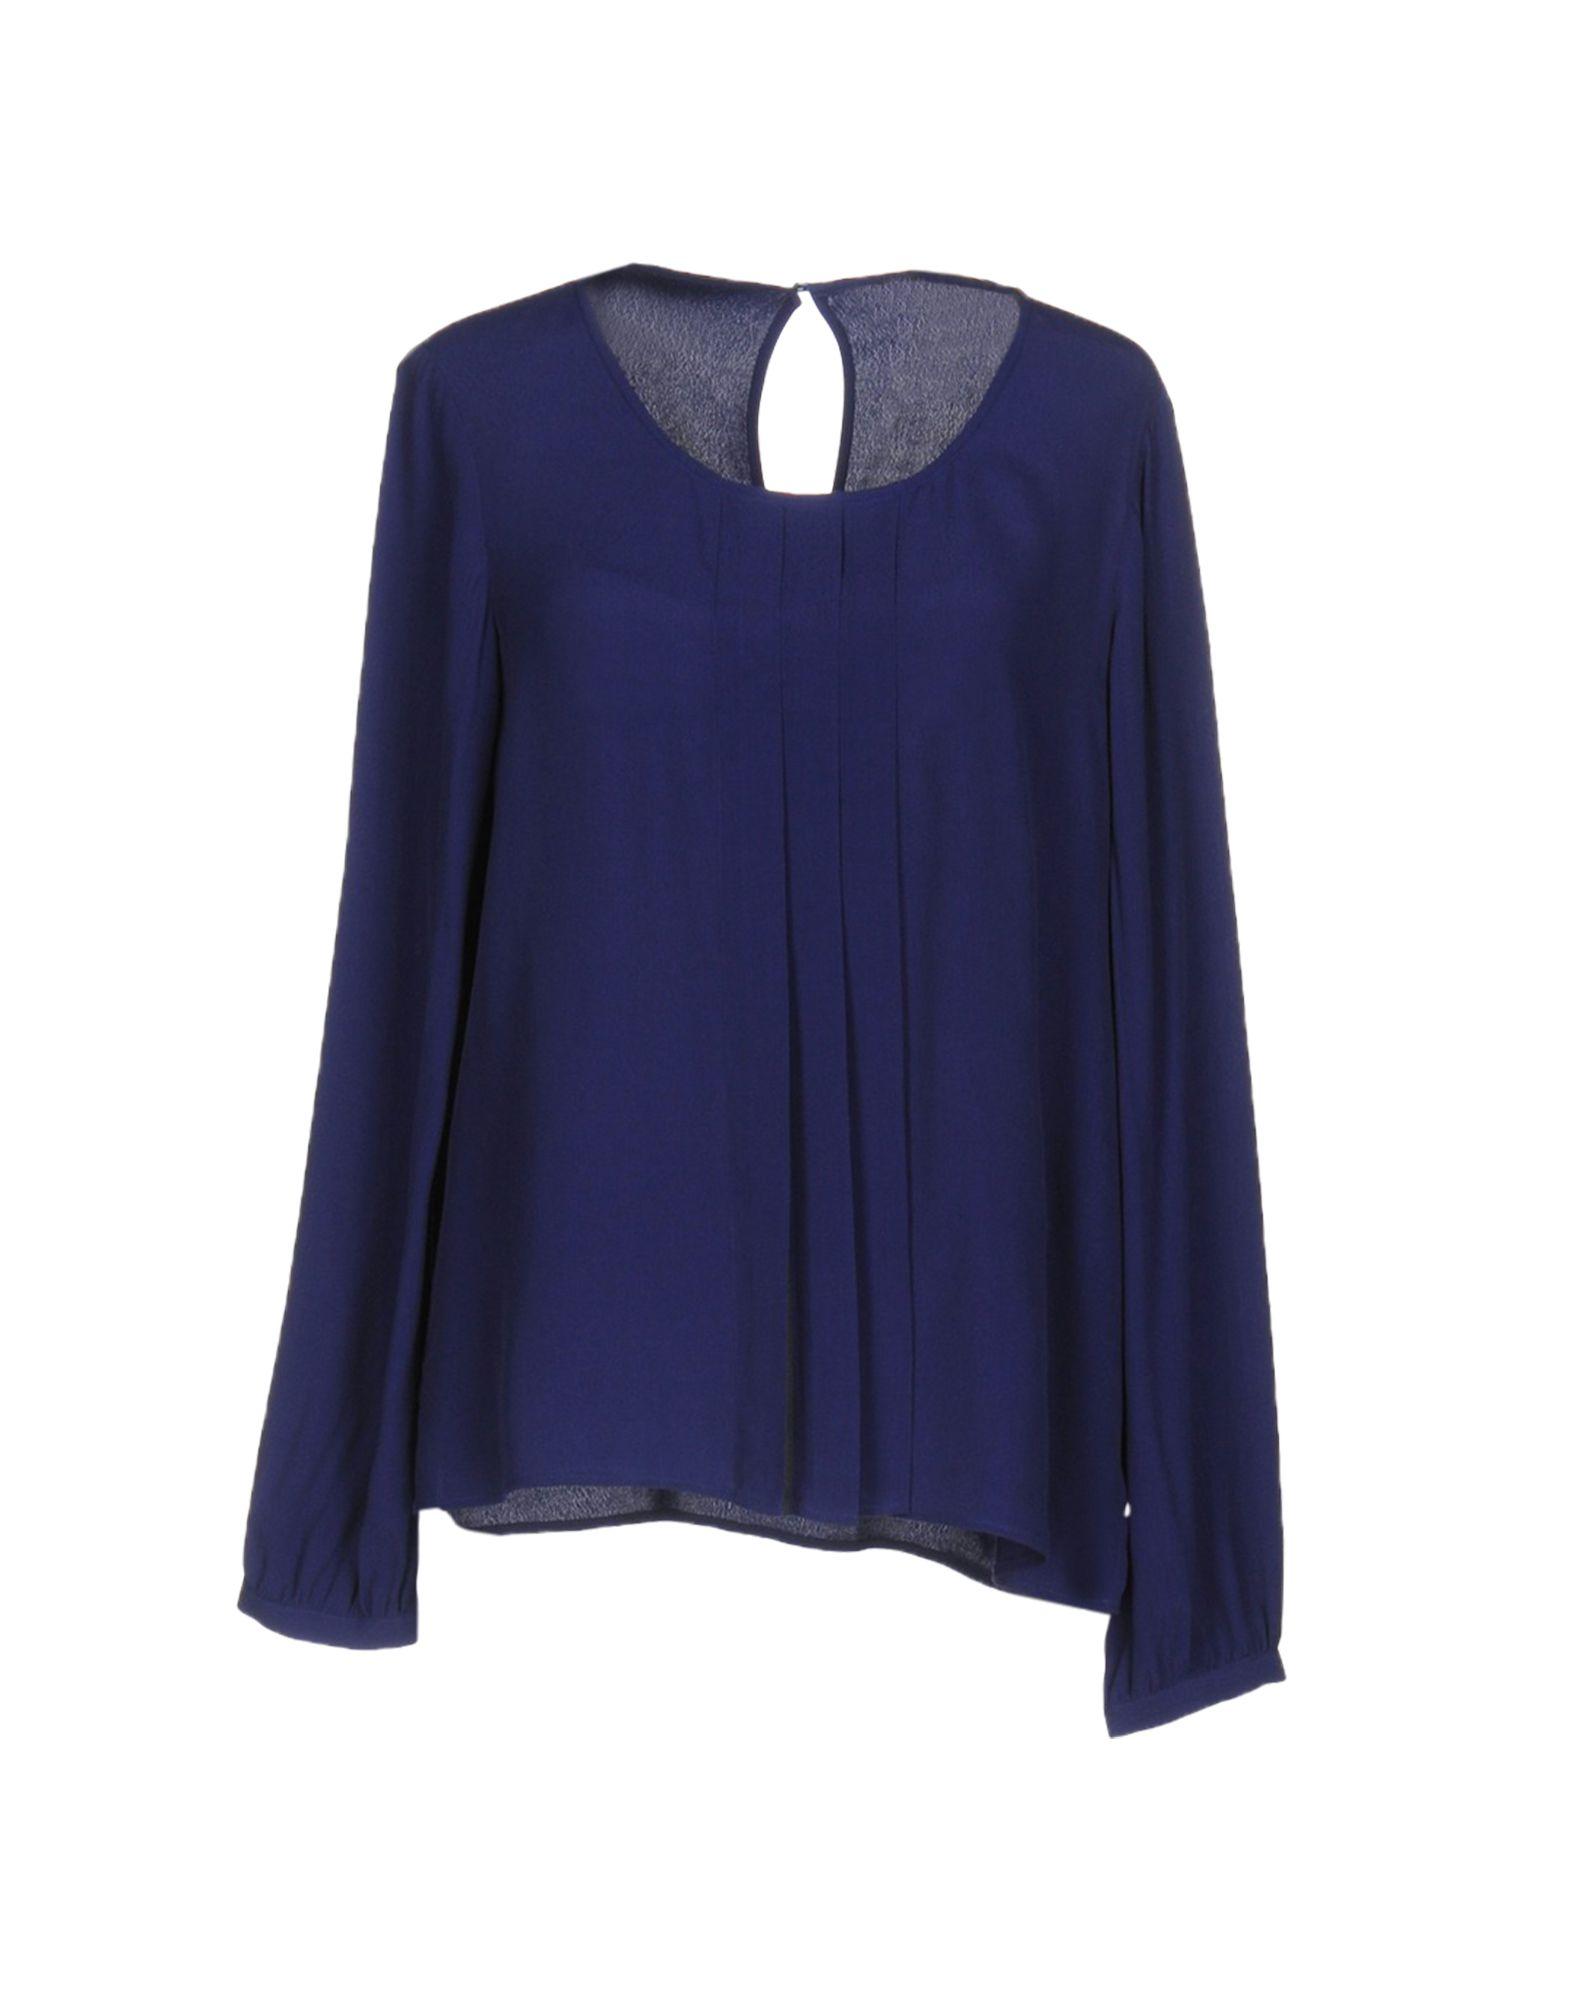 ARMANI JEANS Damen Bluse Farbe Dunkelblau Größe 3